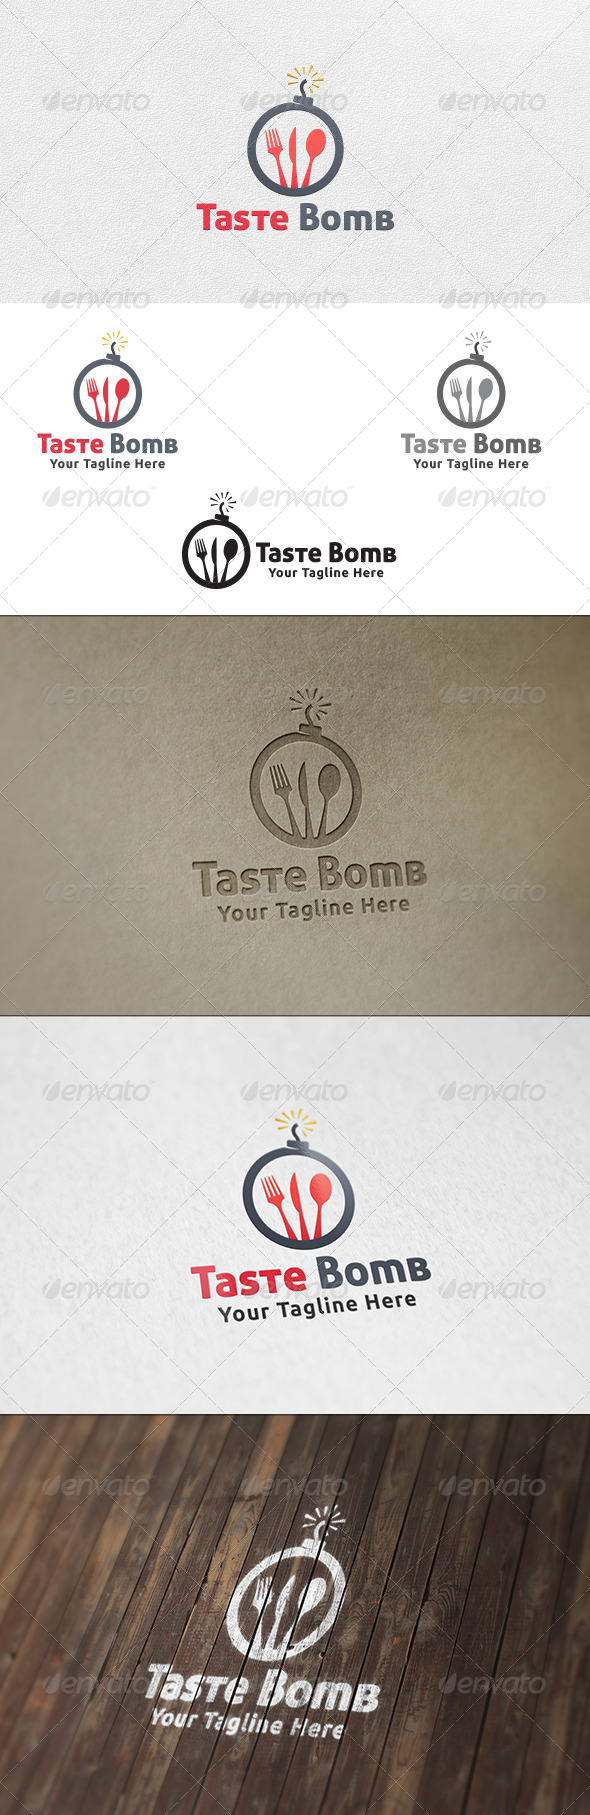 Taste Bomb - Logo Template - Food Logo Templates